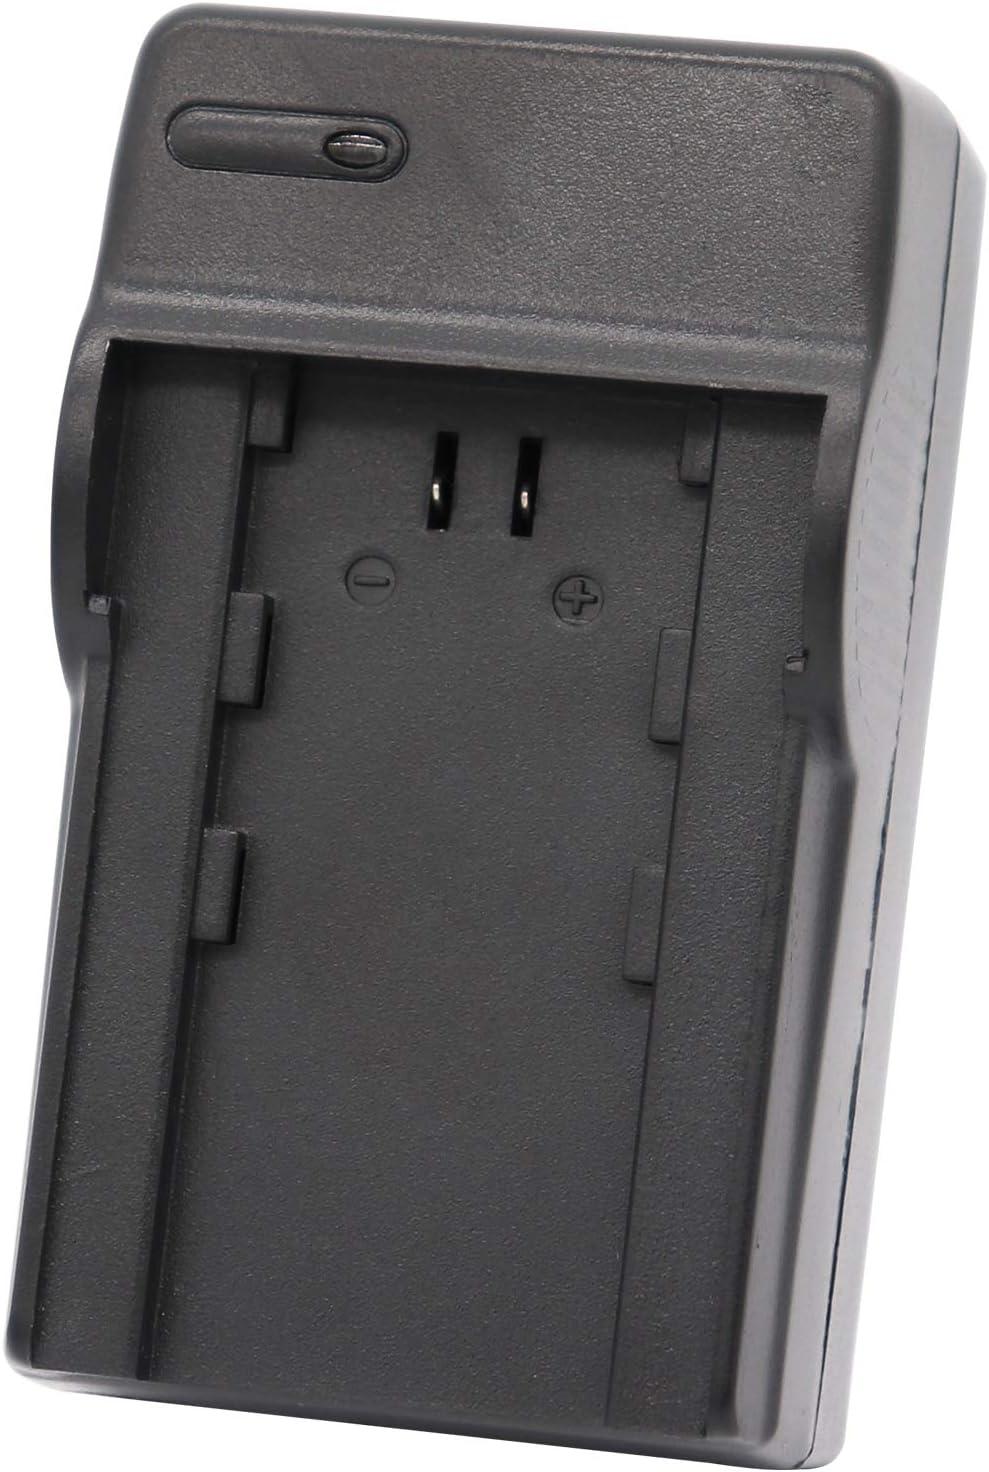 Camera Battery Charger for Camcorder 1000 NP-FV5 Cheap SALE Start 3.7V Plus 1500 Finally resale start